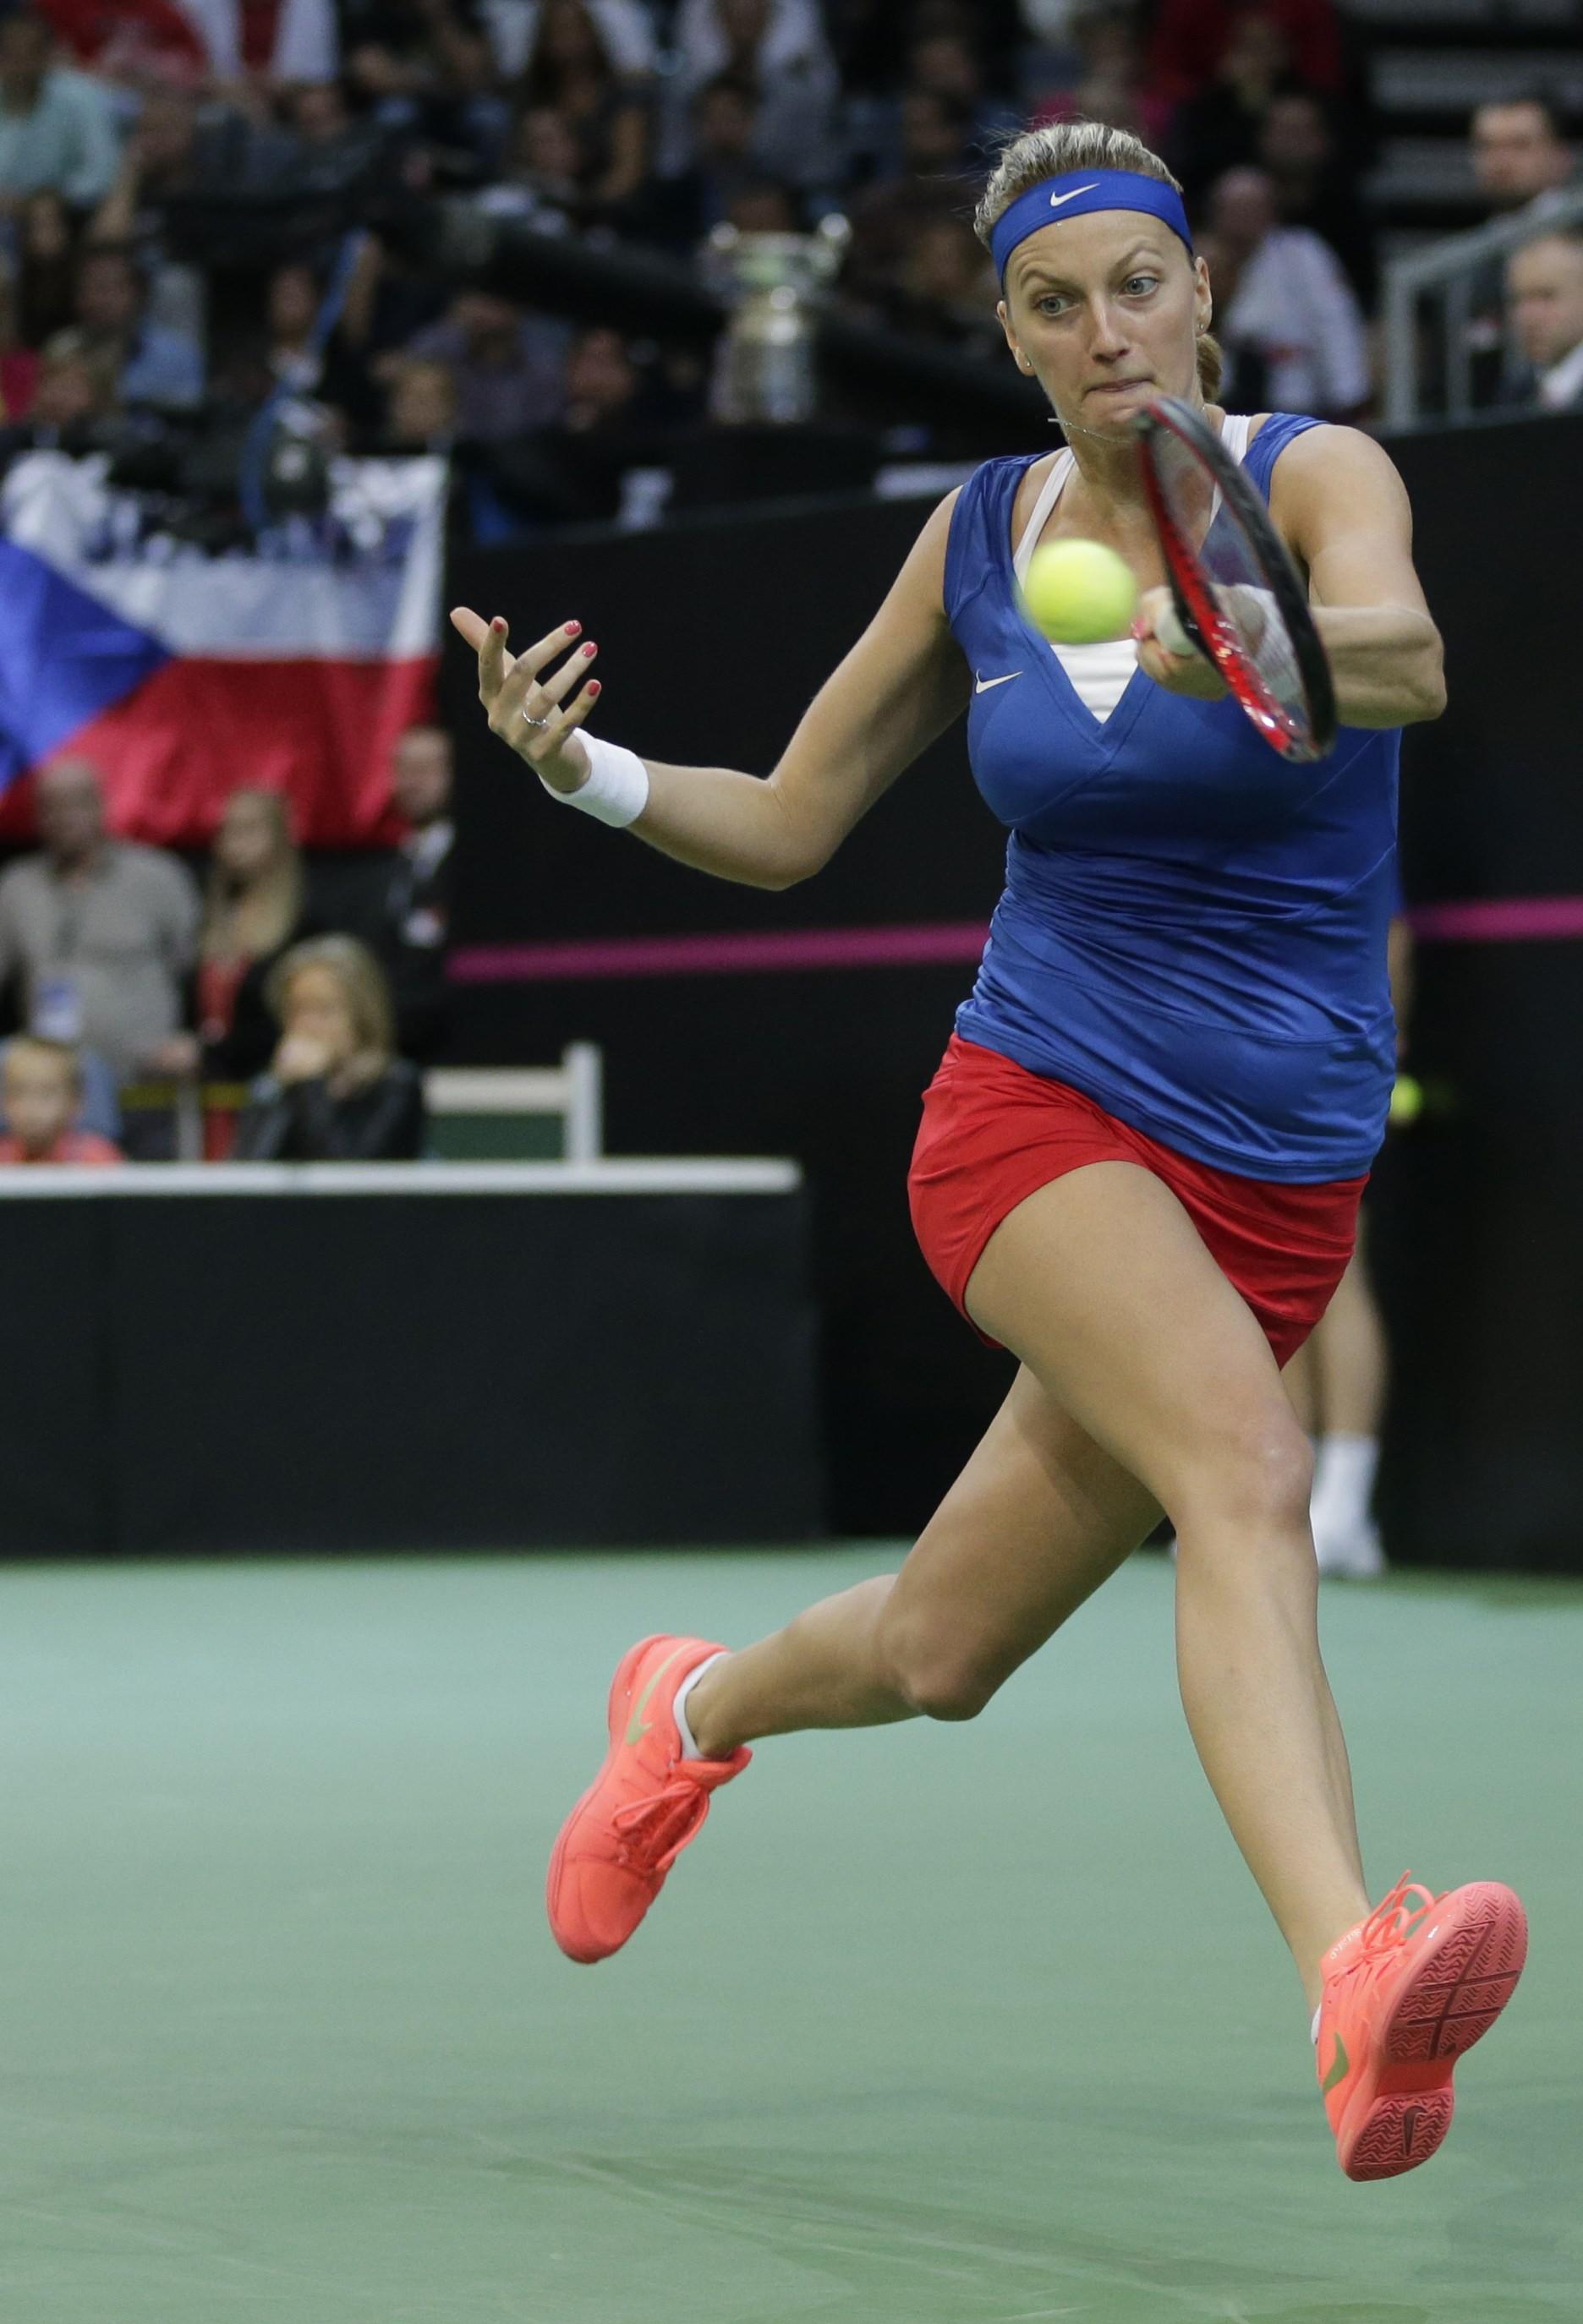 Czech Republic's Petra Kvitova returns a ball to Russia's Maria Sharapova during their Fed Cup tennis final match between Czech Republic and Russia in Prague, Czech Republic, Sunday, Nov. 15, 2015. (AP Photo/Petr David Josek)